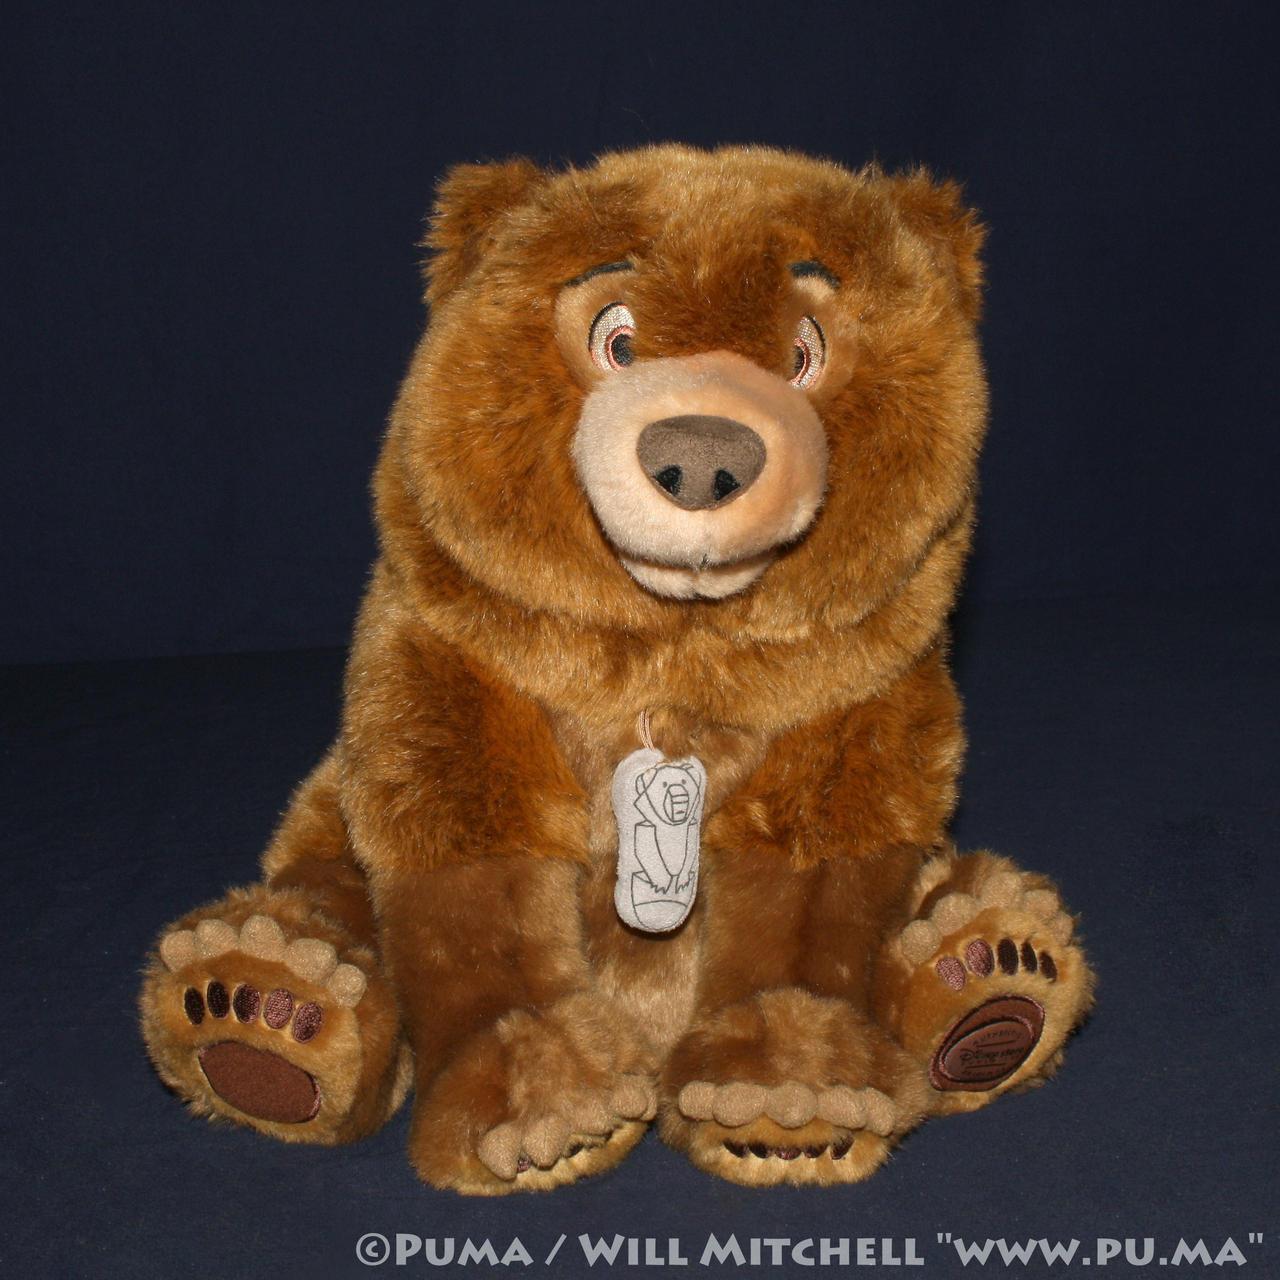 DisneyStore - Brother Bear - Kenai Plush 2003 by dapumakat